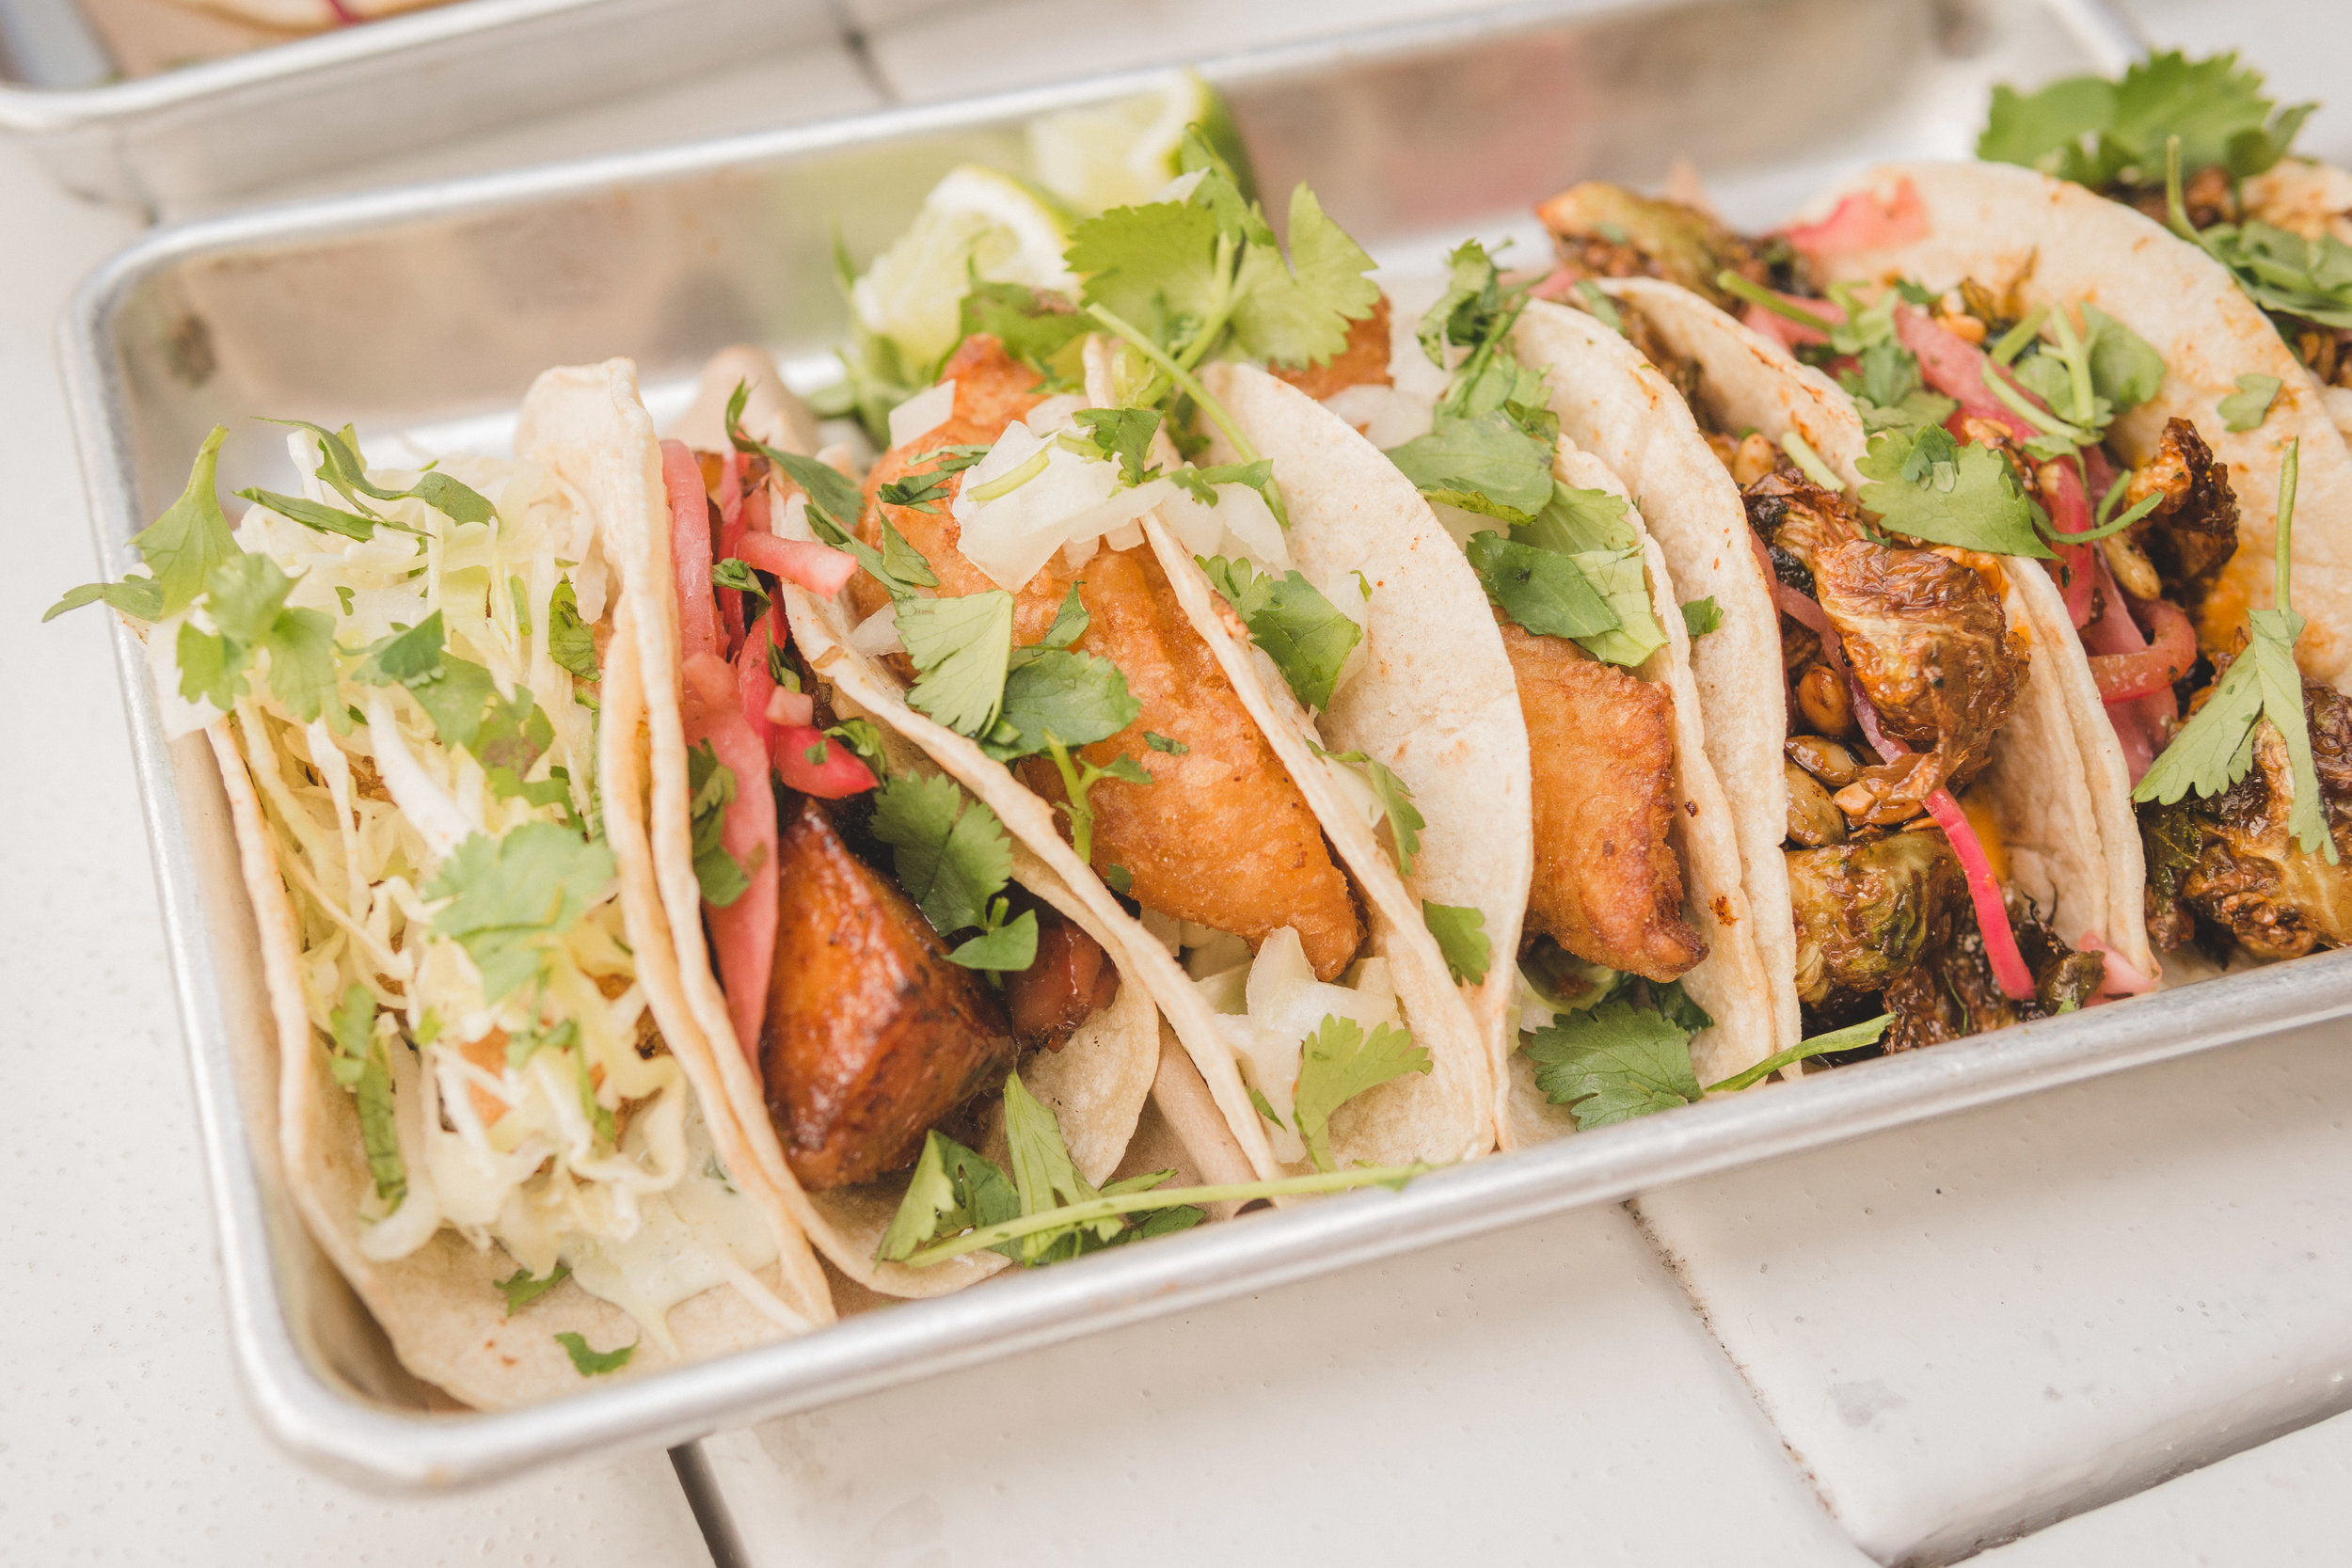 Some of our go-to usual orders: Crispy Rock Shrimp, Glazed Pork Belly & Baja Fish Tacos